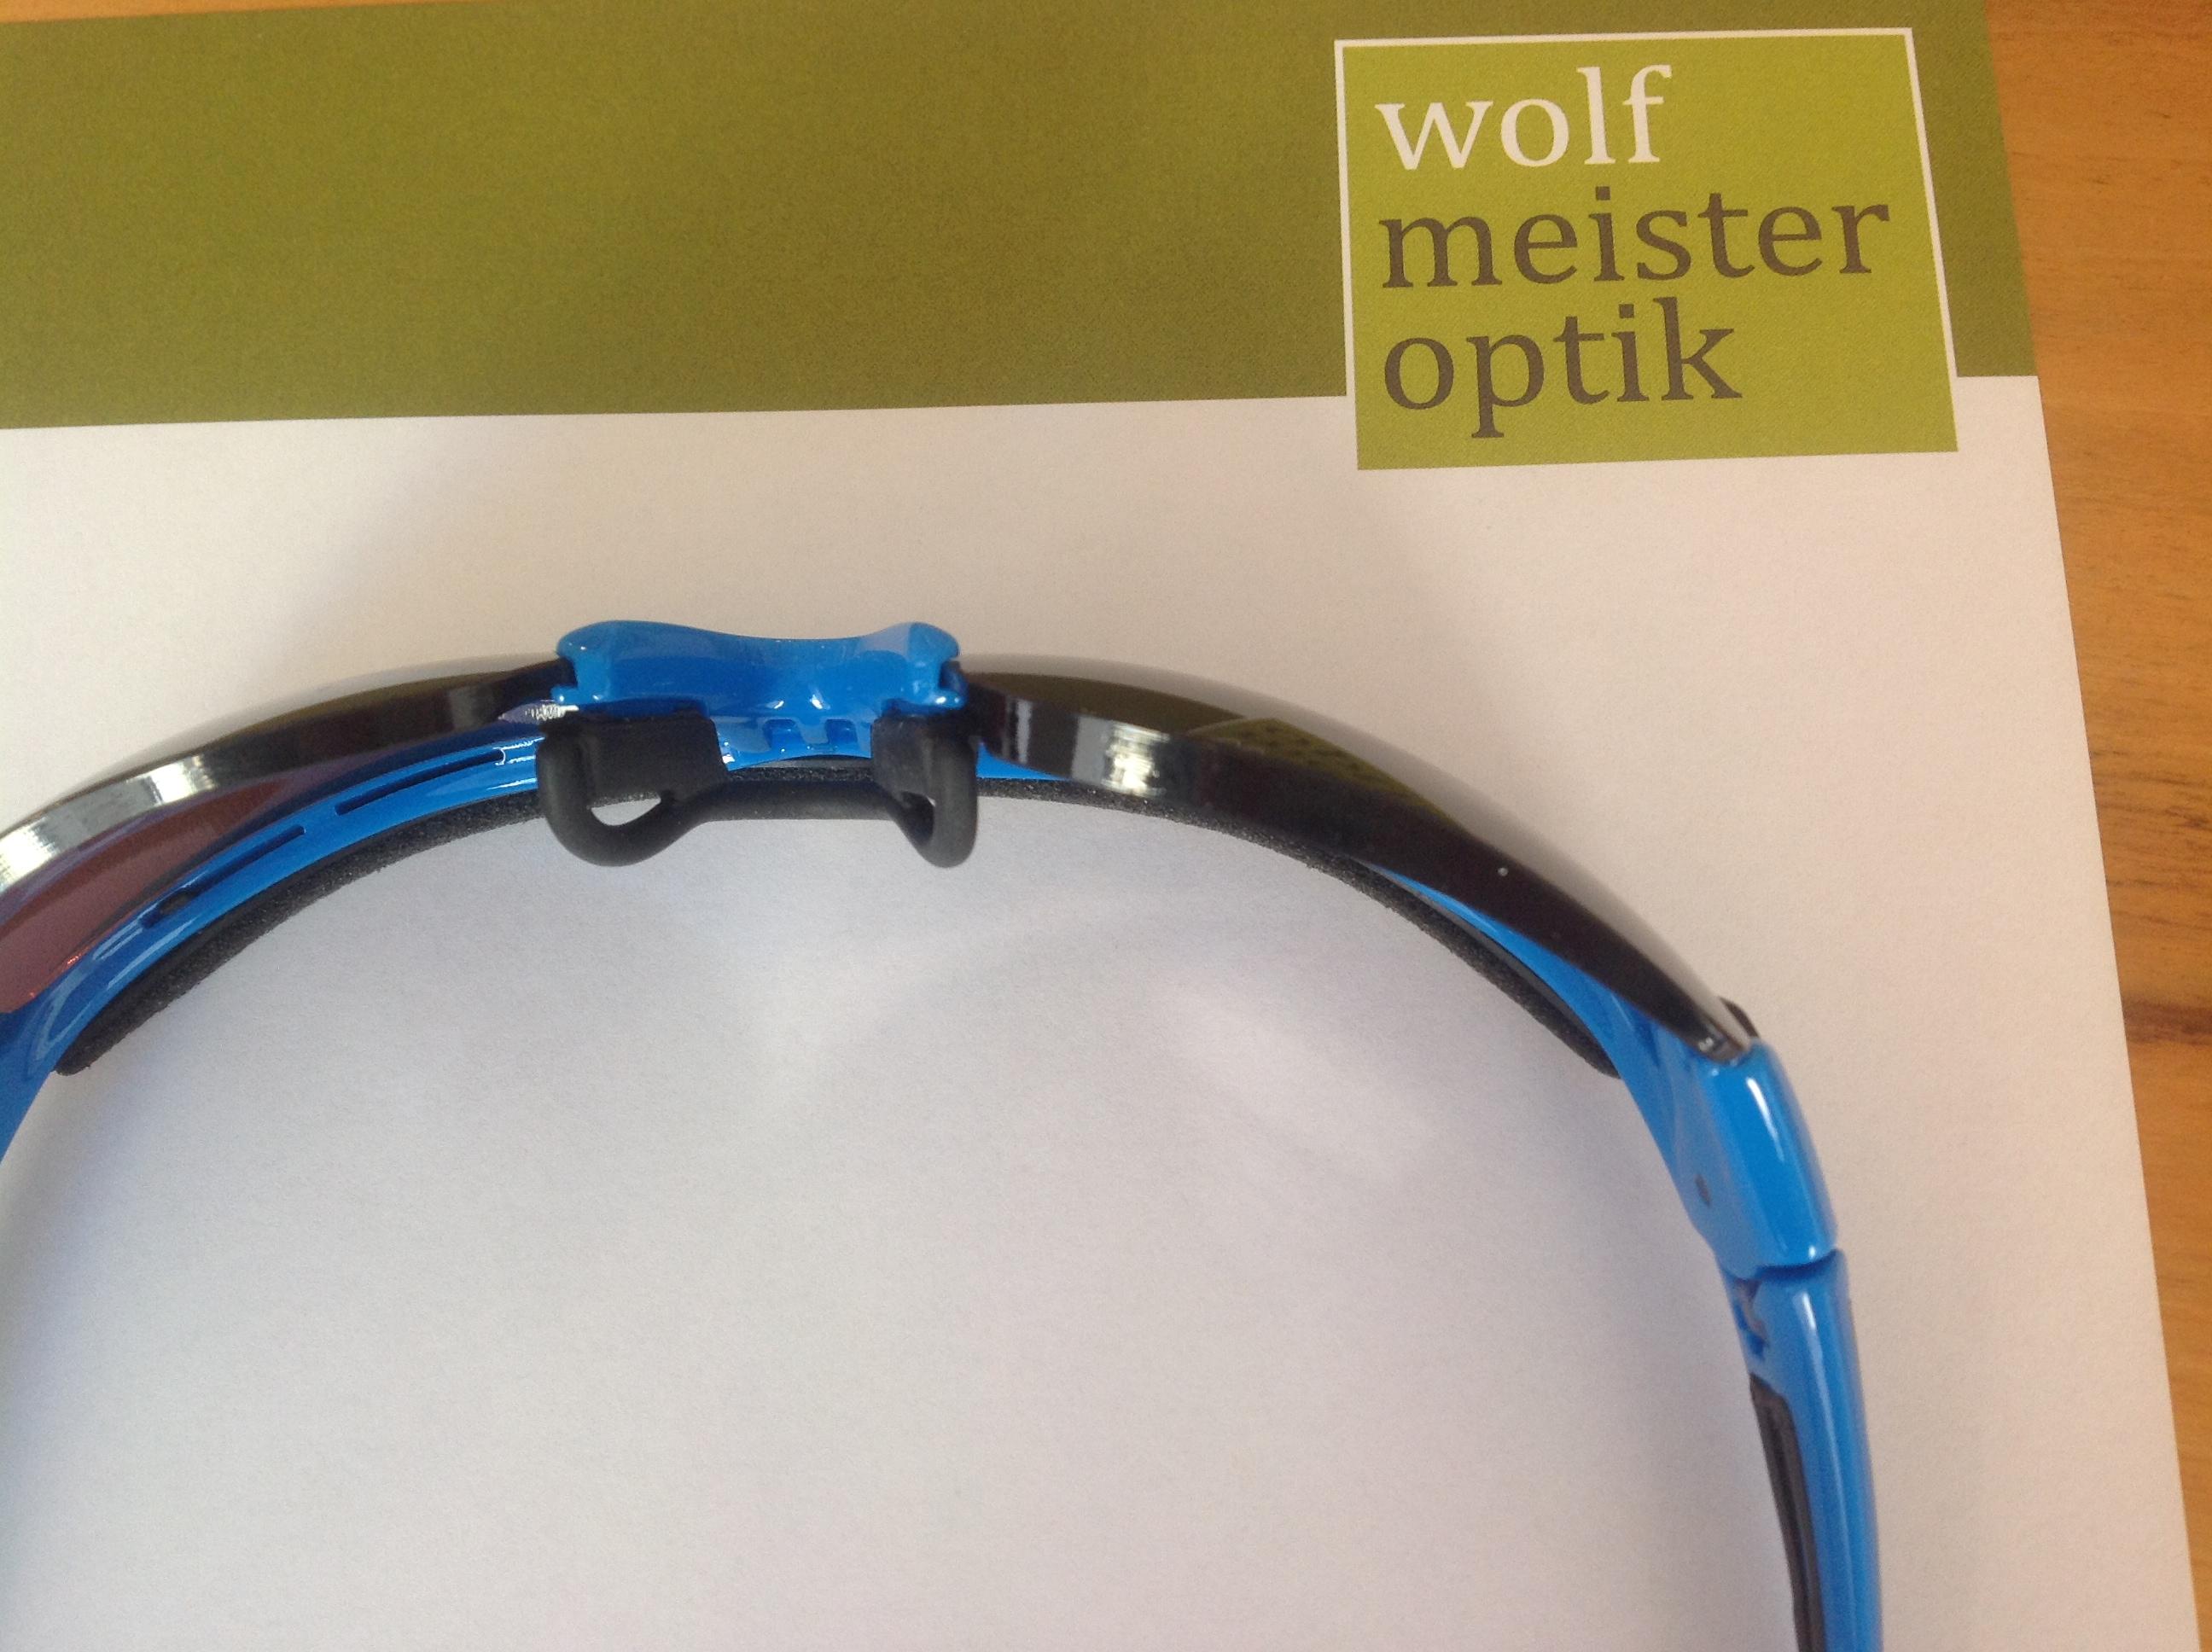 sportbrillen mit sehst rke wolf meister optik. Black Bedroom Furniture Sets. Home Design Ideas